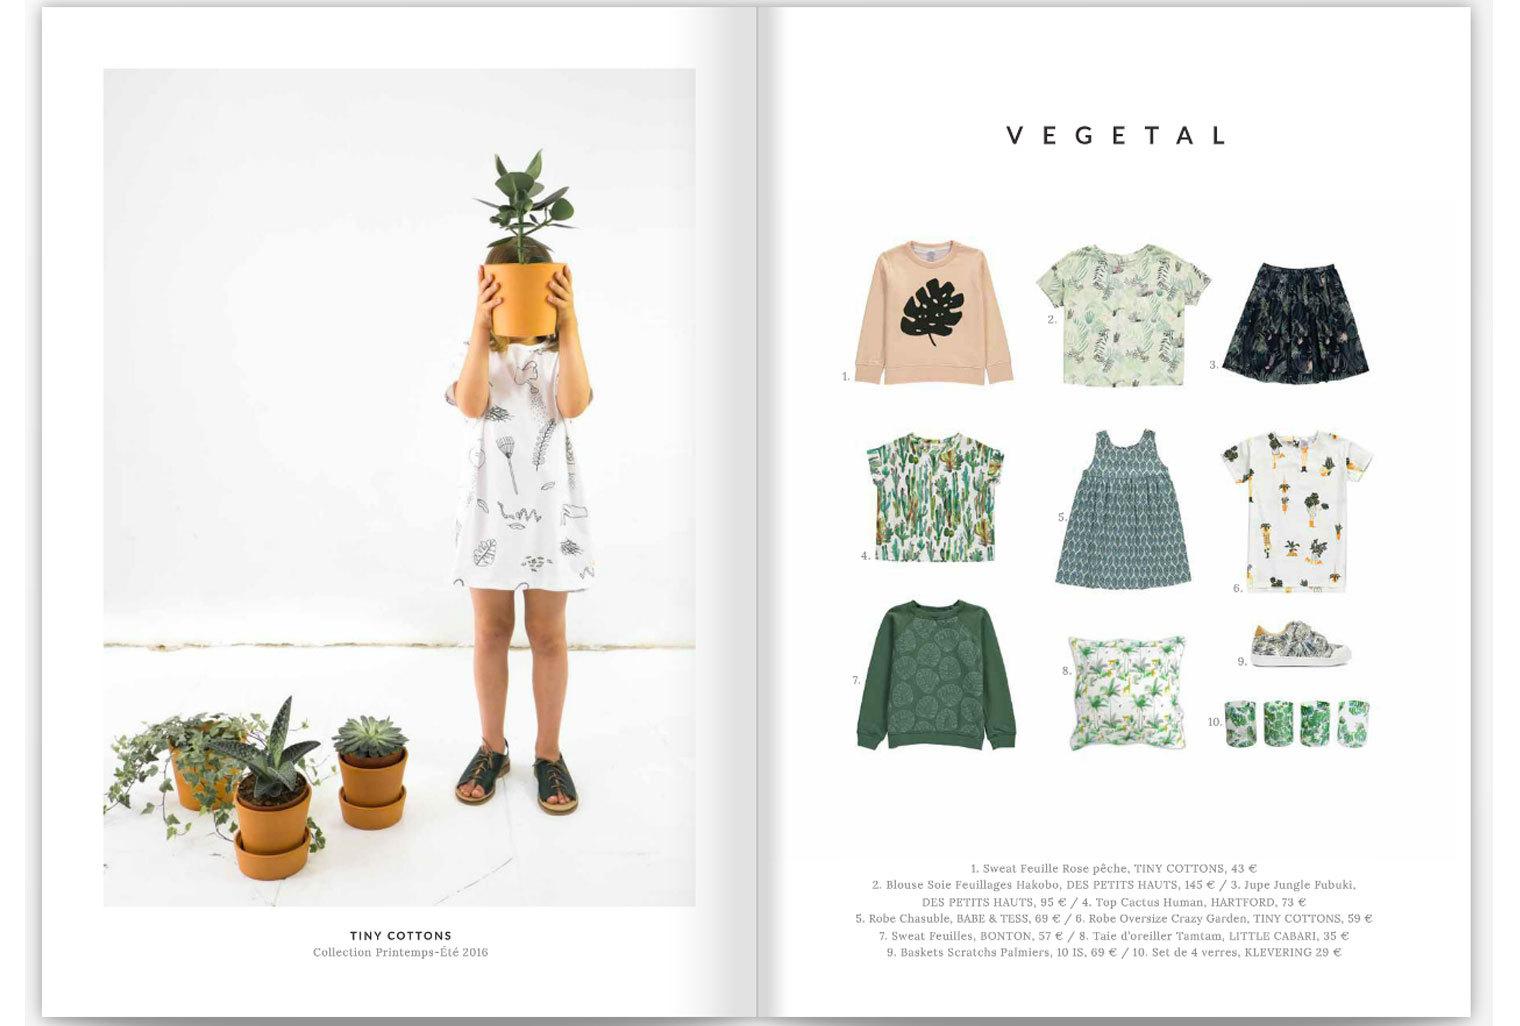 Oreiller TamTam Minty dans Smallable Magazine